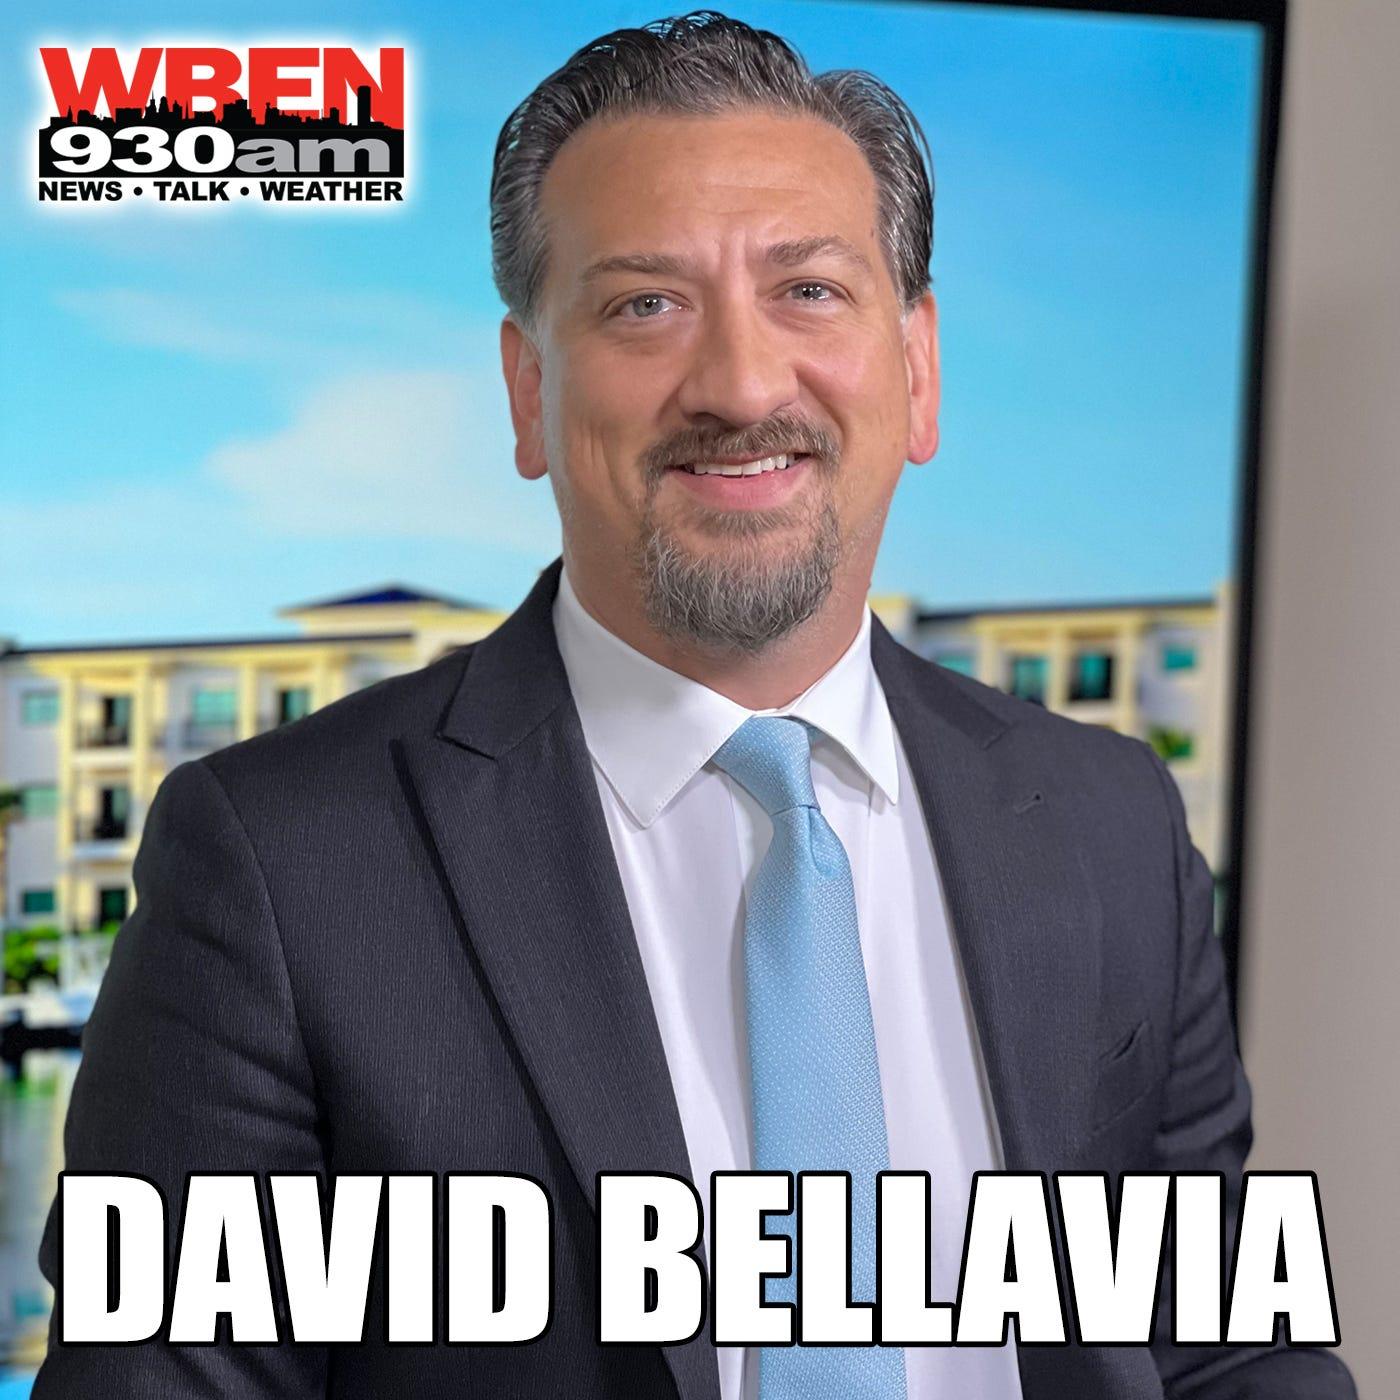 David Bellavia Breaking Down Duel Town Halls 10-16 Hour 2